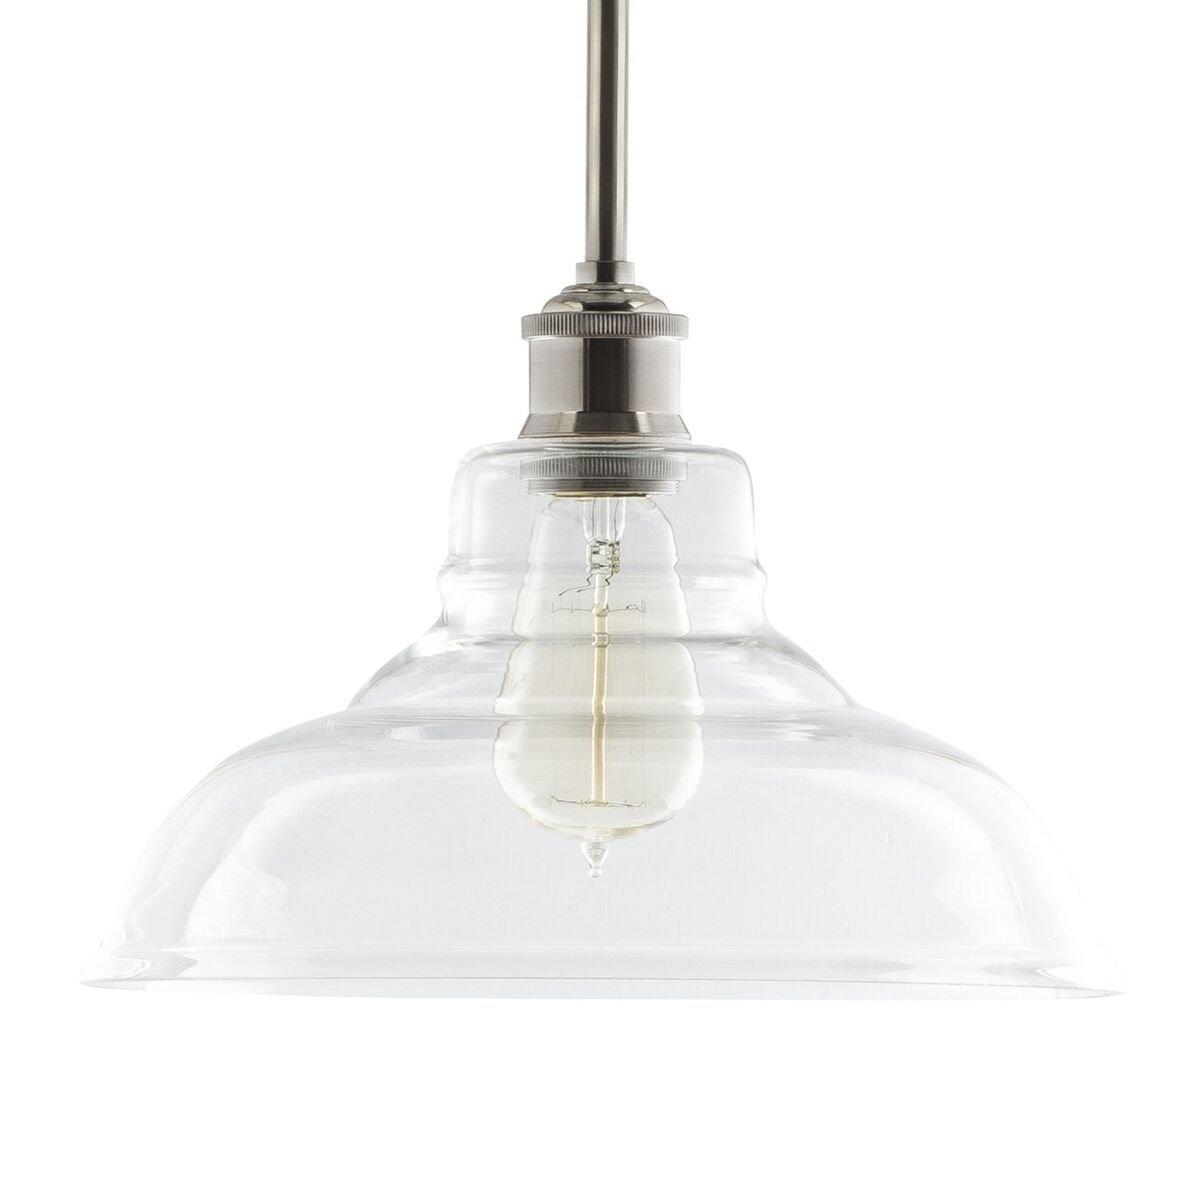 Lucera Contemporary Kitchen Pendant Light - Brushed Nickel Hanging Fixture - Linea di Liara LL-P431-BN